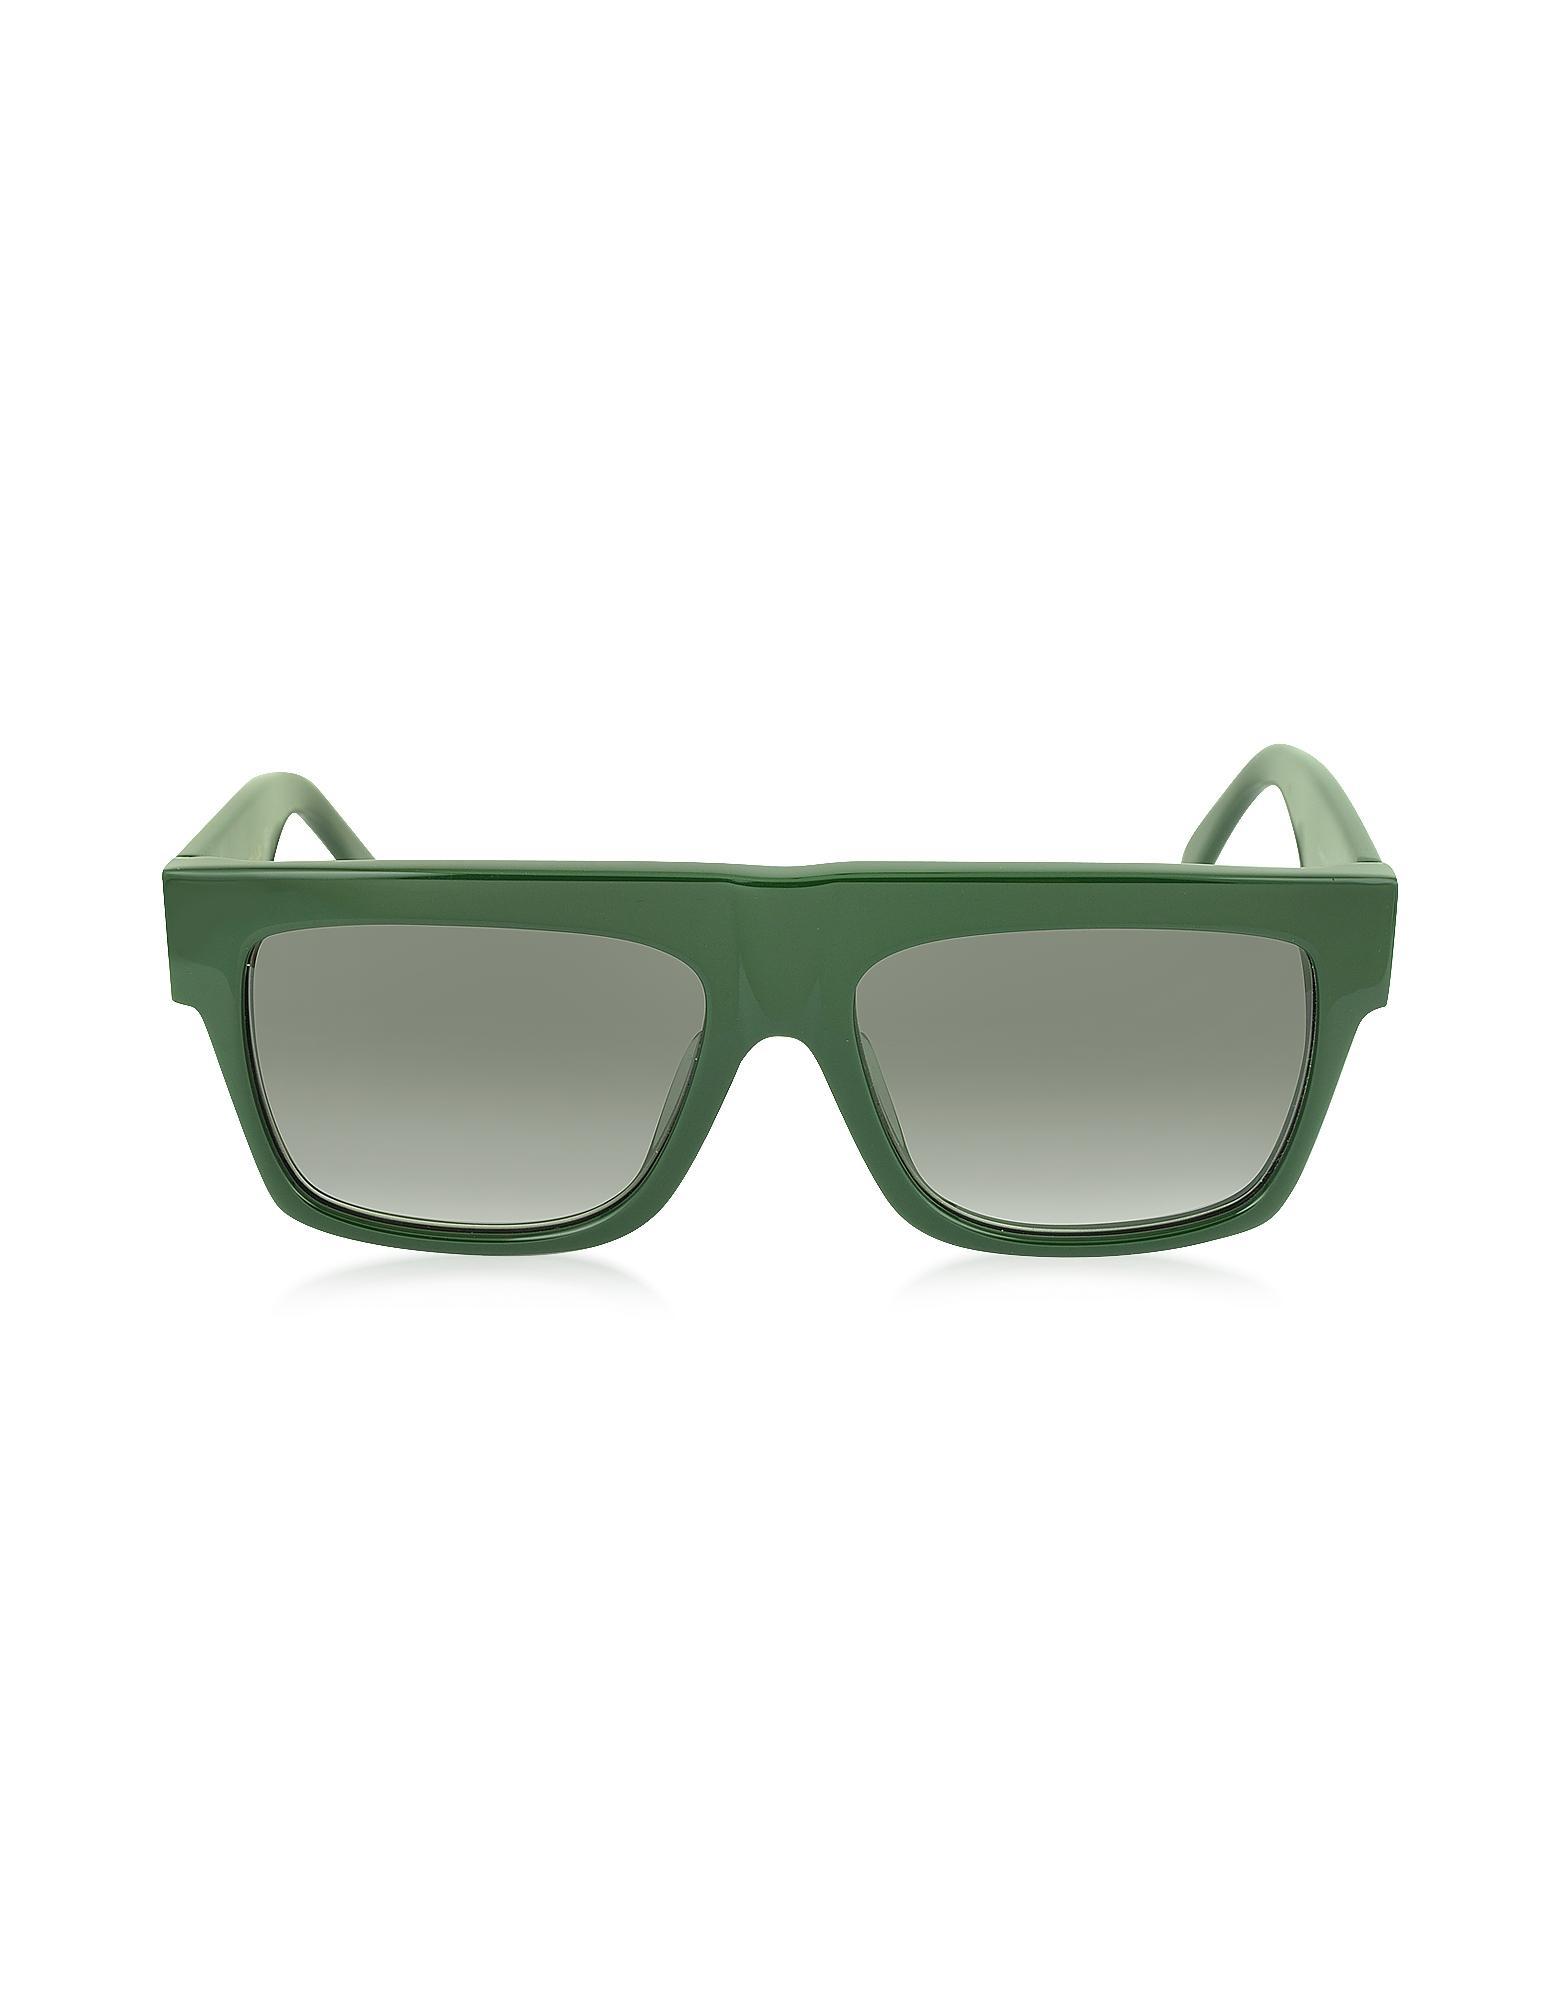 6a57fbc93946 CELINE CL 41066 S SMALL ZZ BLACK Source · Lyst C line Cl 41066 s Small Zz  Green Acetate Women s Sunglasses